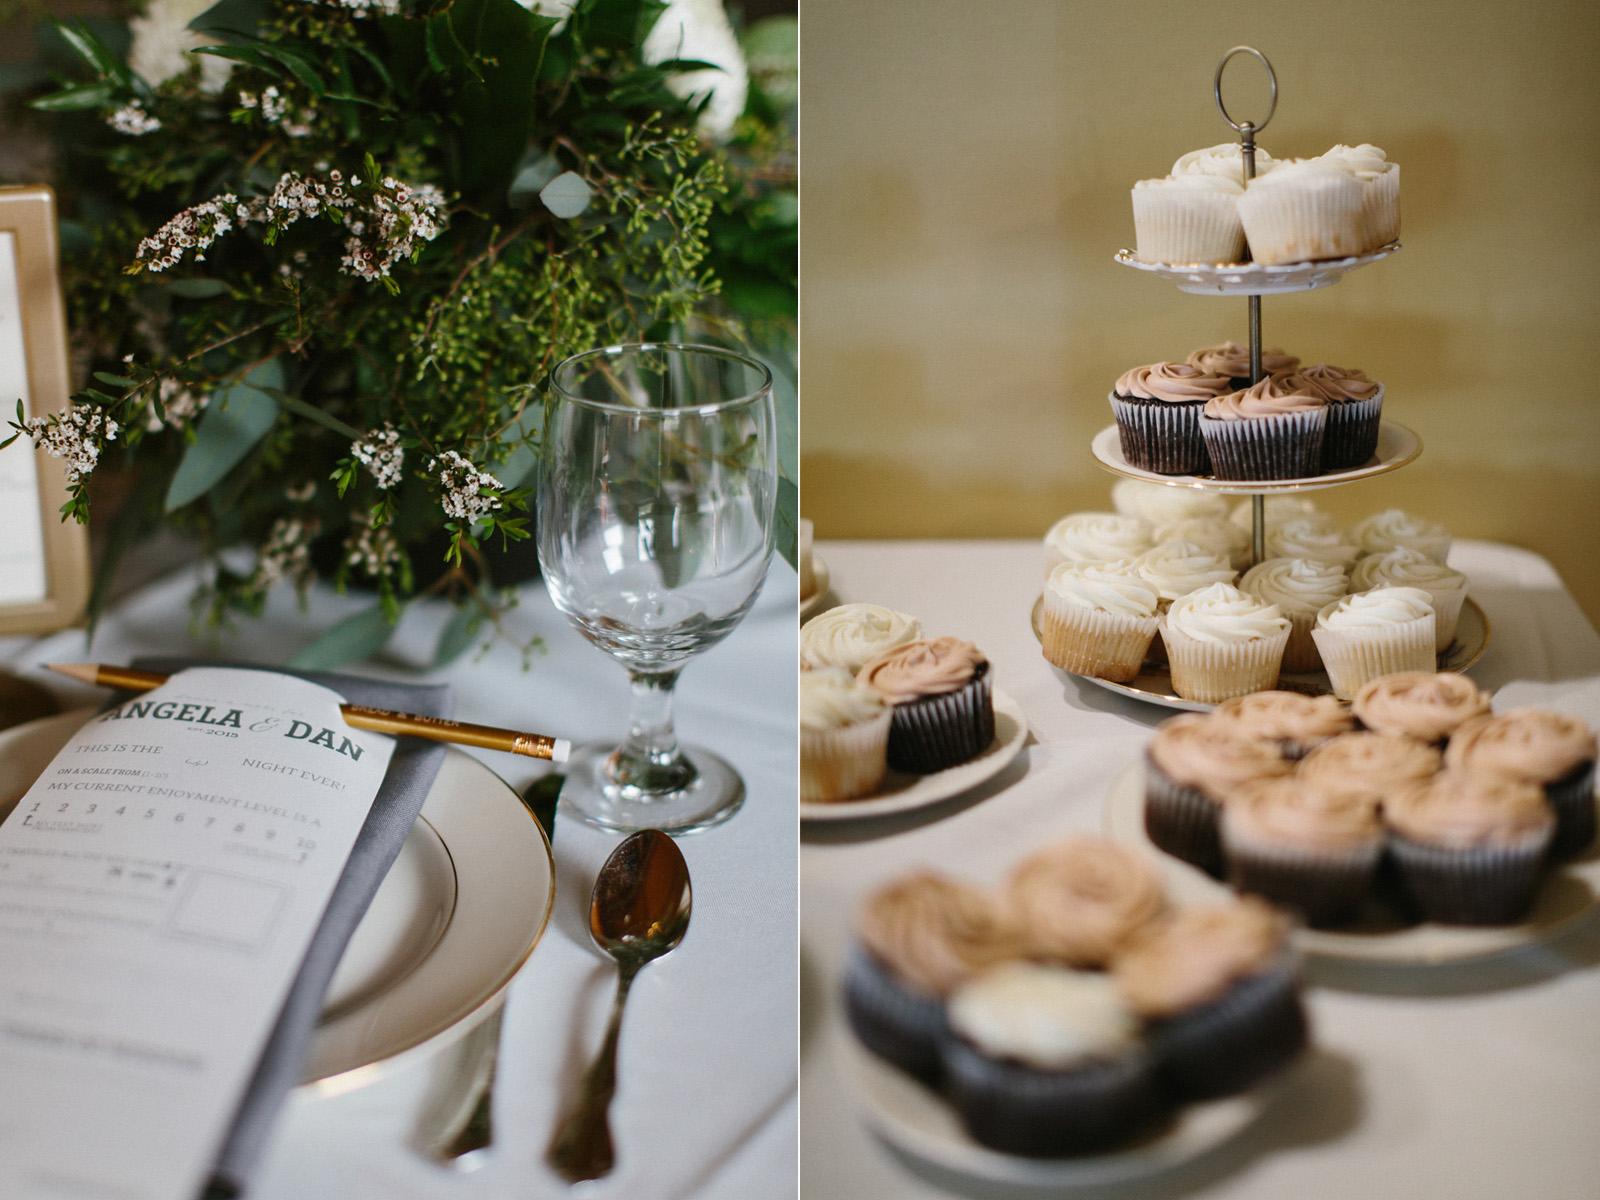 sioux_falls_desmoines_wedding_photographer_48.jpg